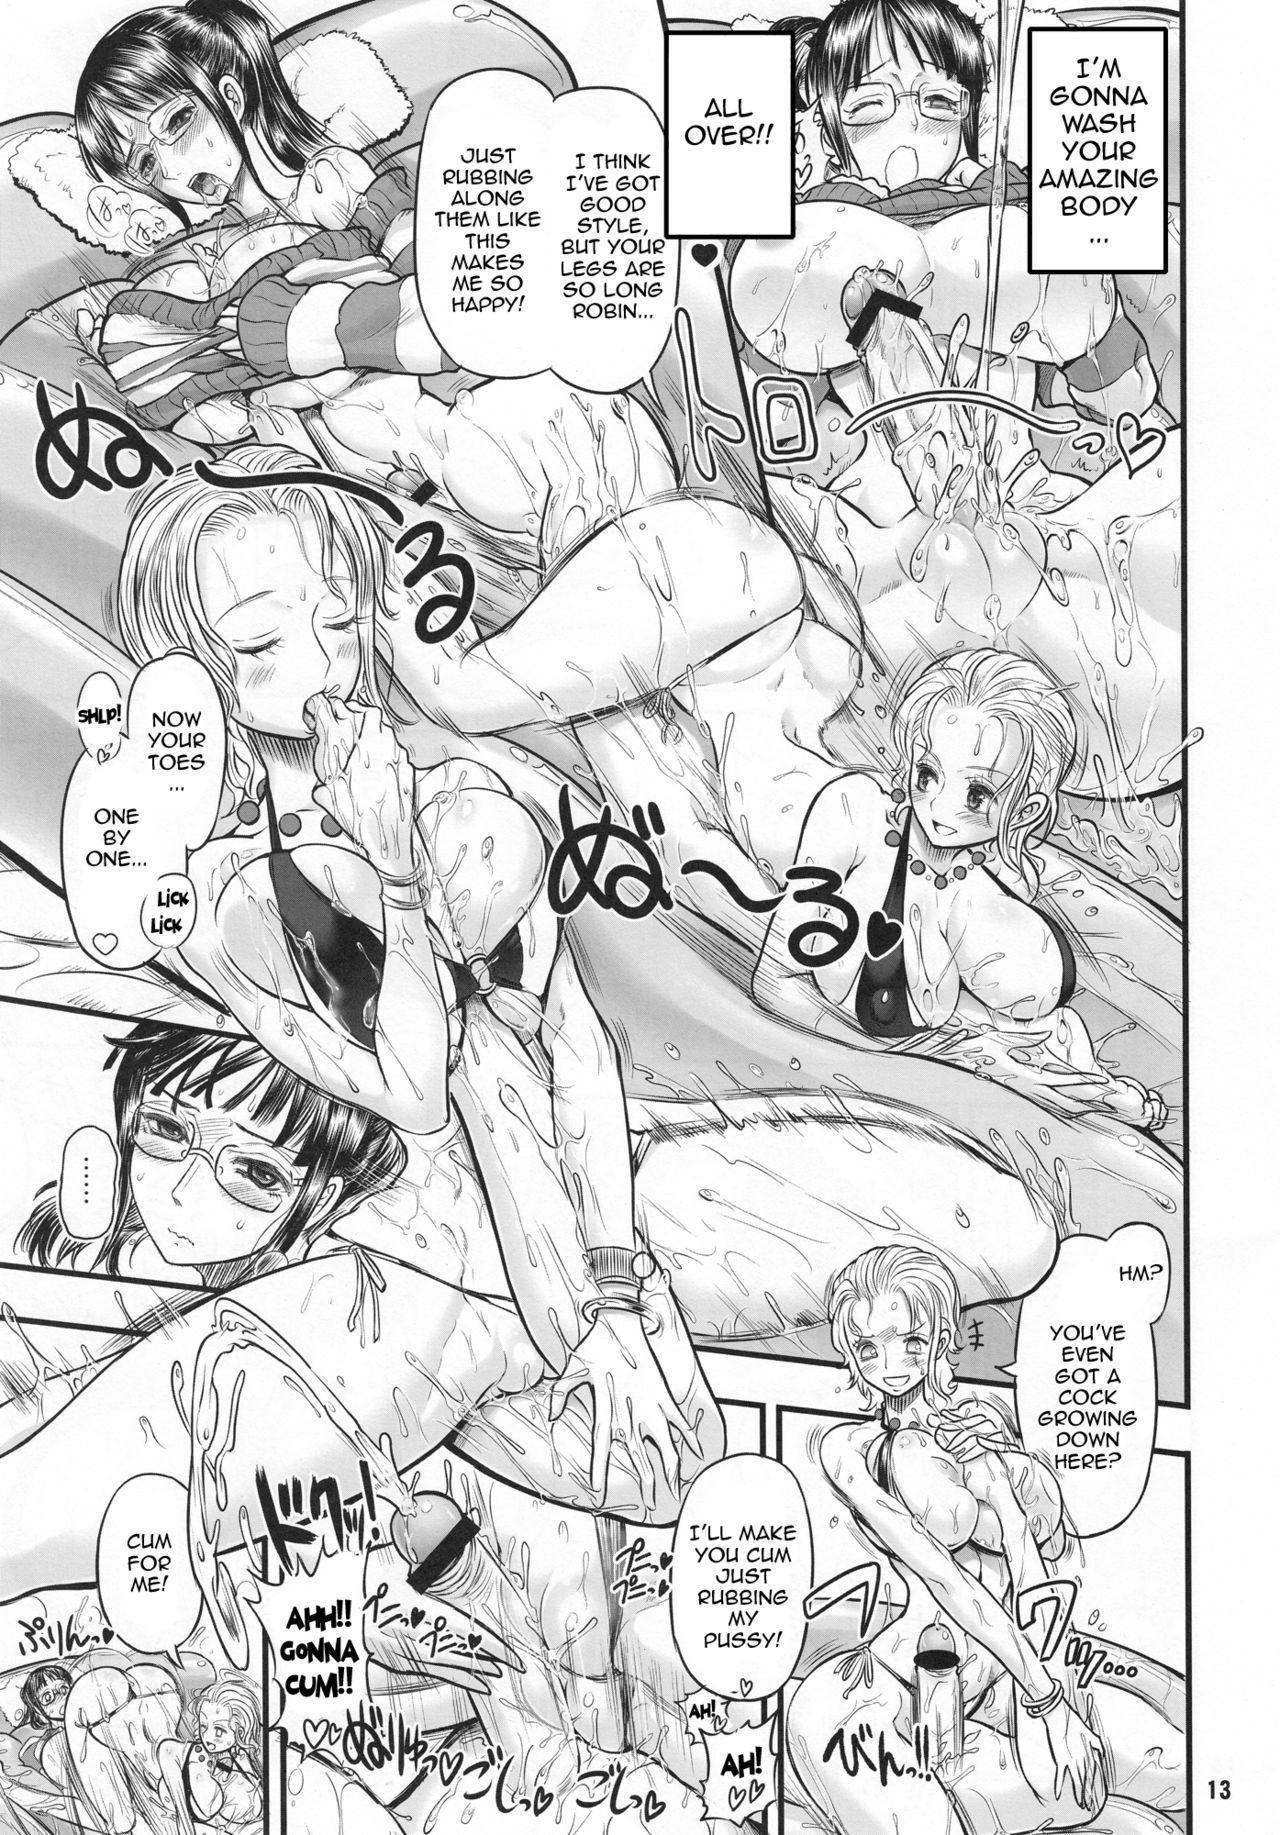 Midare Saki Joshuu Kaizoku Soushuuhen   Bloom, Pirate Hooker! Bloom! Annual 44